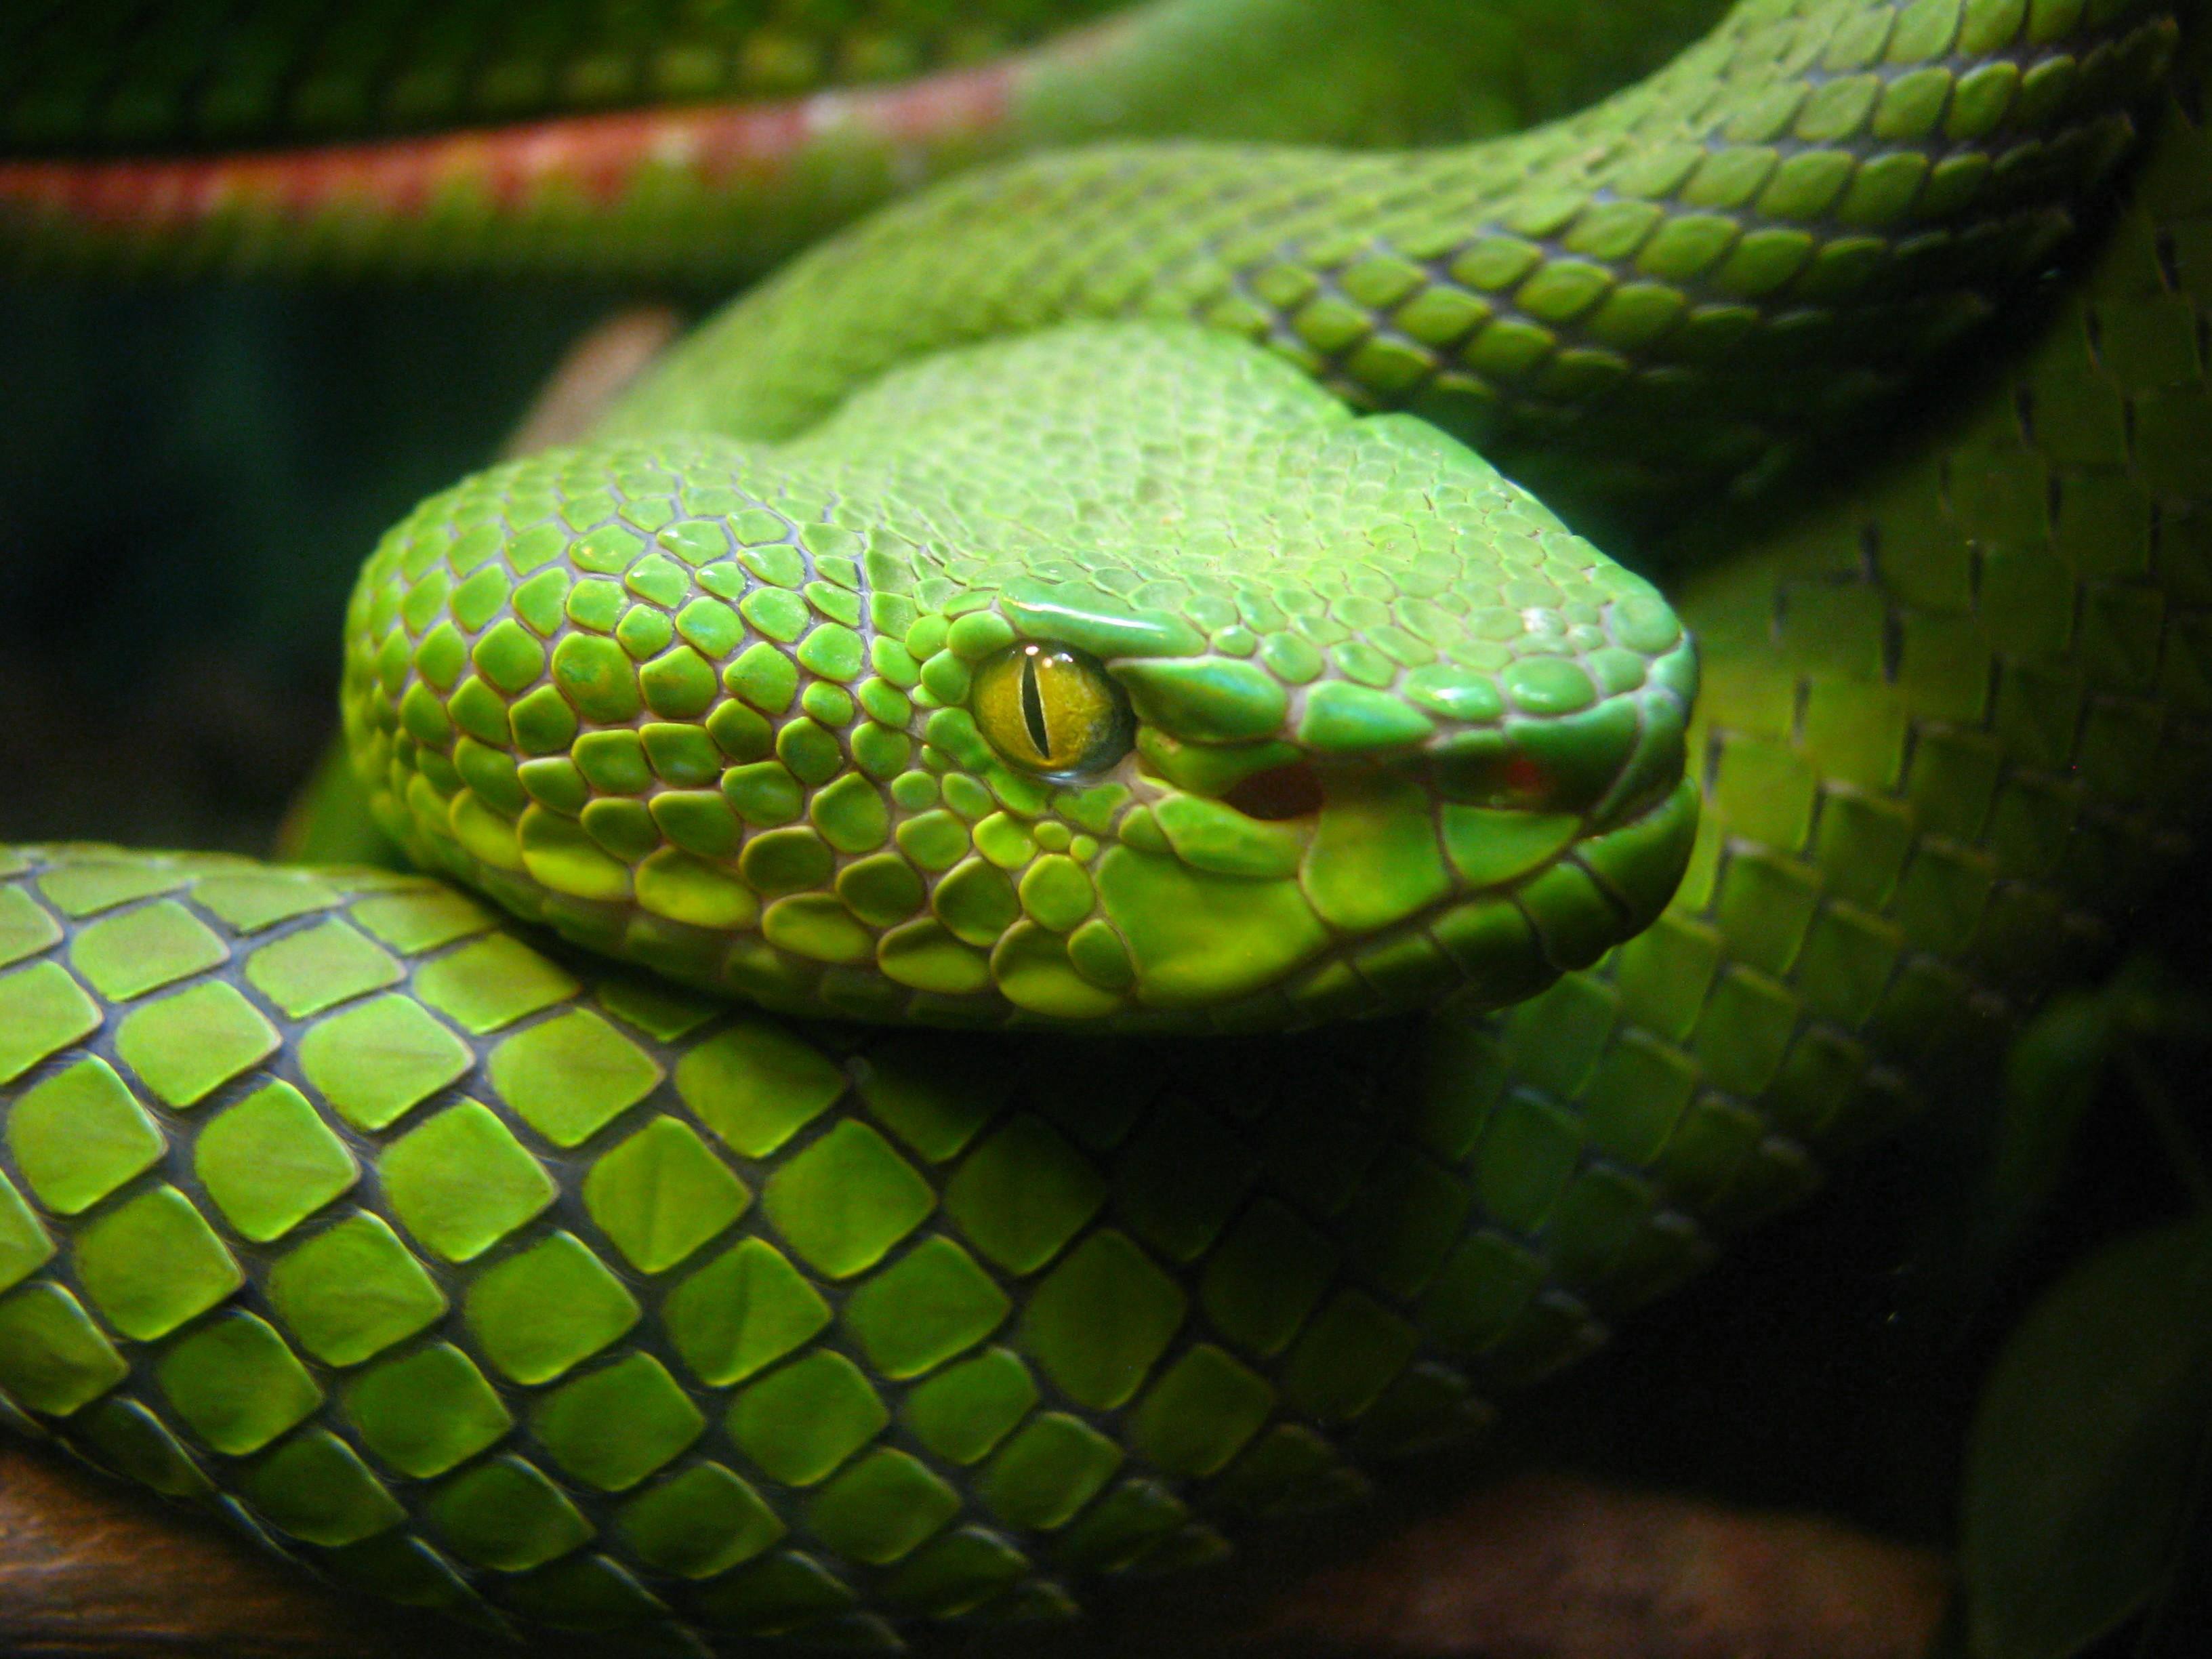 Pit viper snake wallpaper - photo#51